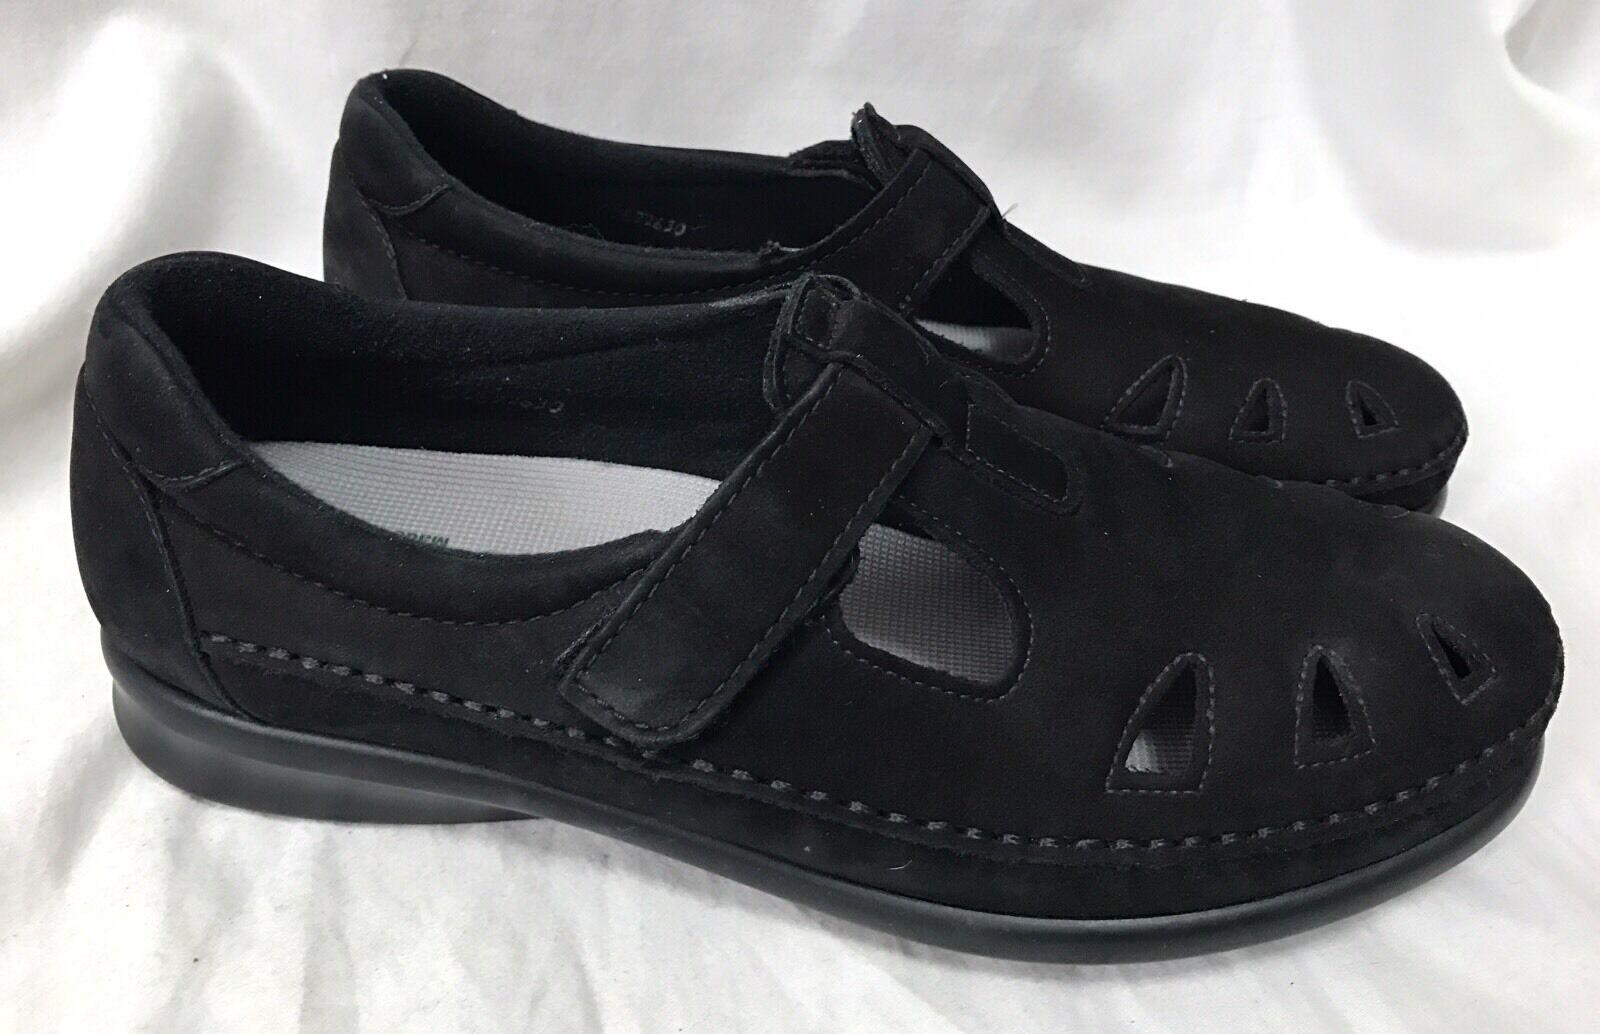 SAS Roamer Black Suede Loafers 9M Moc Toe Tripad Comfort Walking shoes